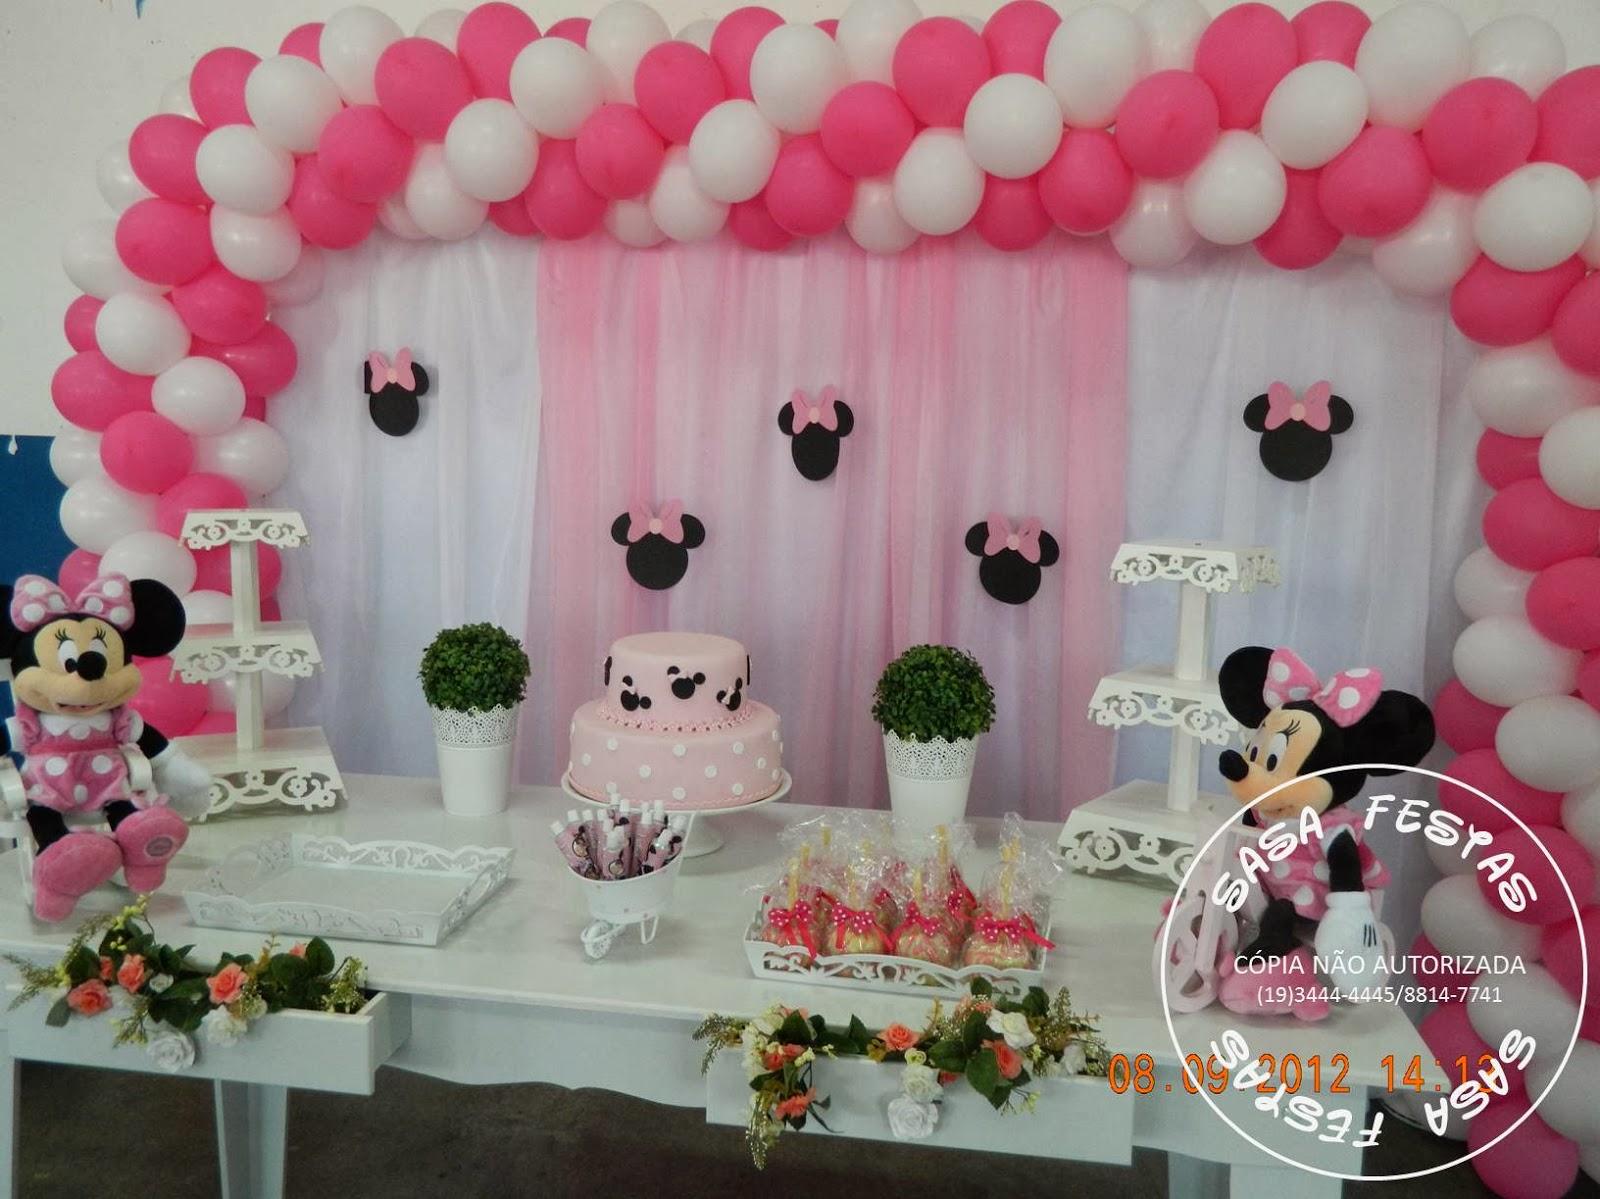 Ana Ottobeli Ideias aniversário da Minnie